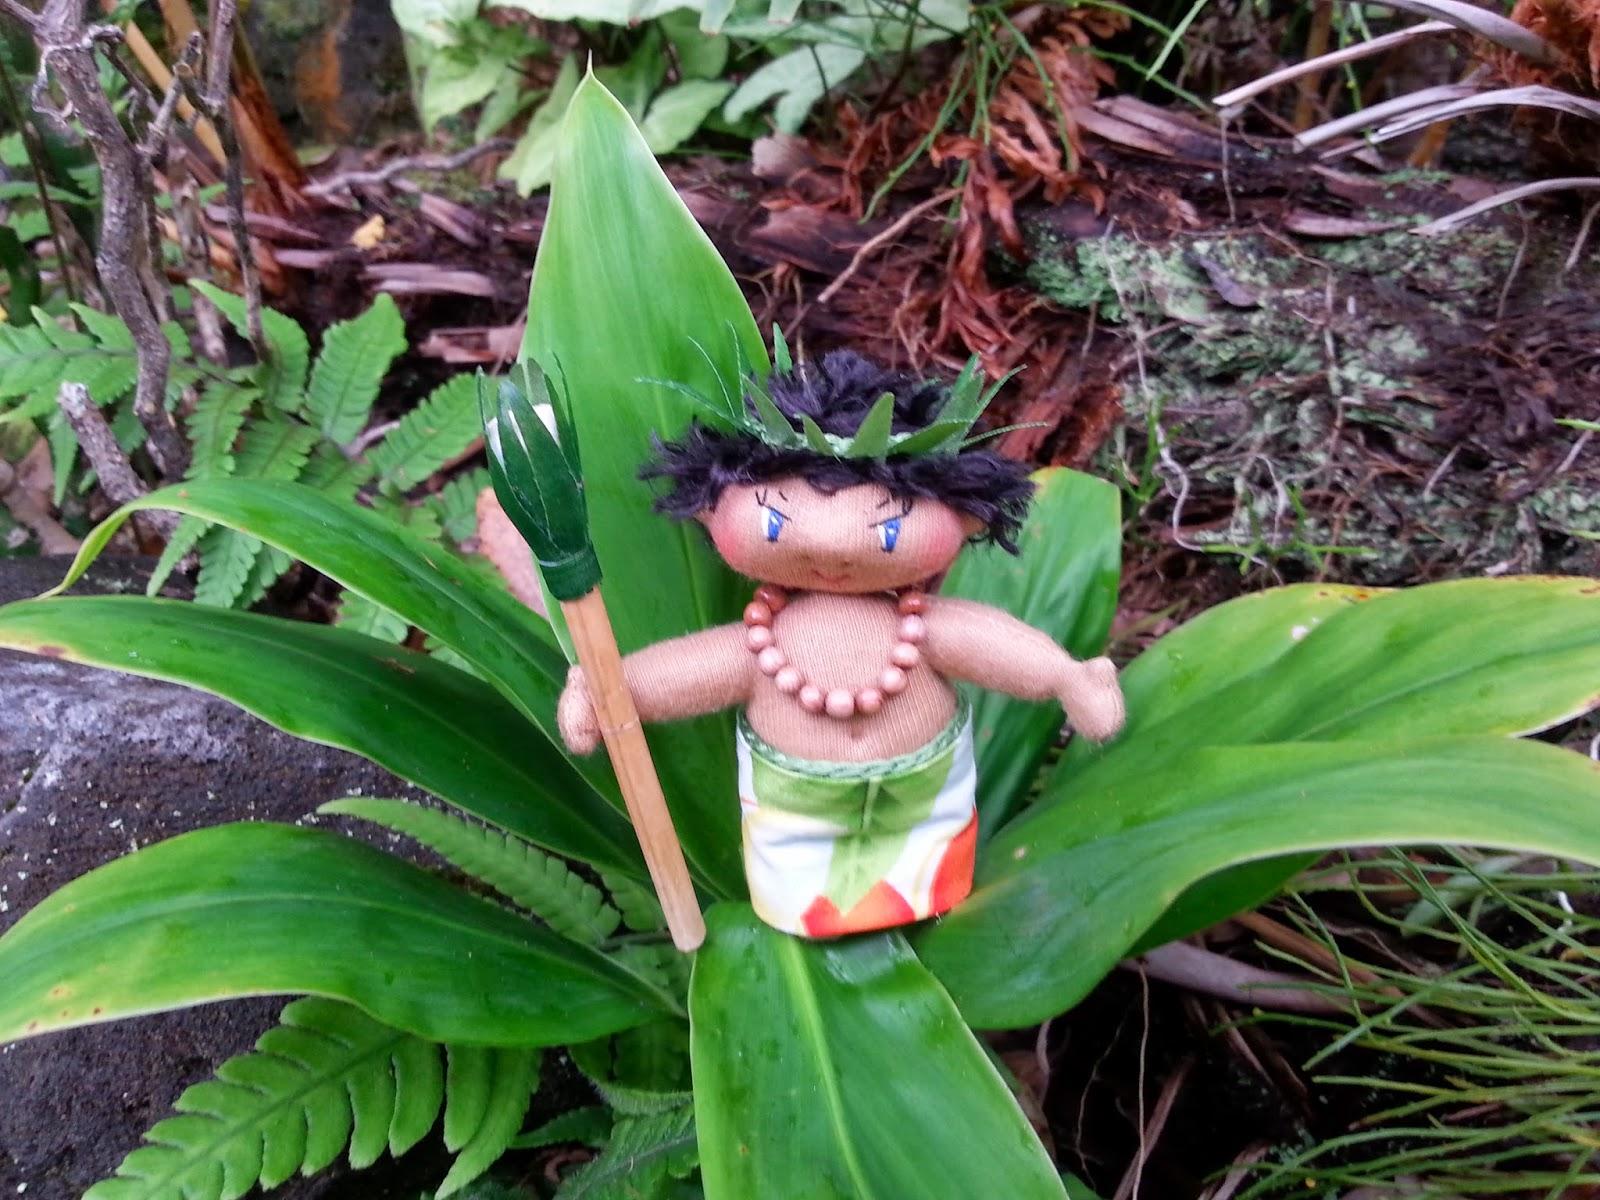 Magical hawaiian menehune dolls magical powers of hawaiian ti leaves magical powers of hawaiian ti leaves buycottarizona Gallery